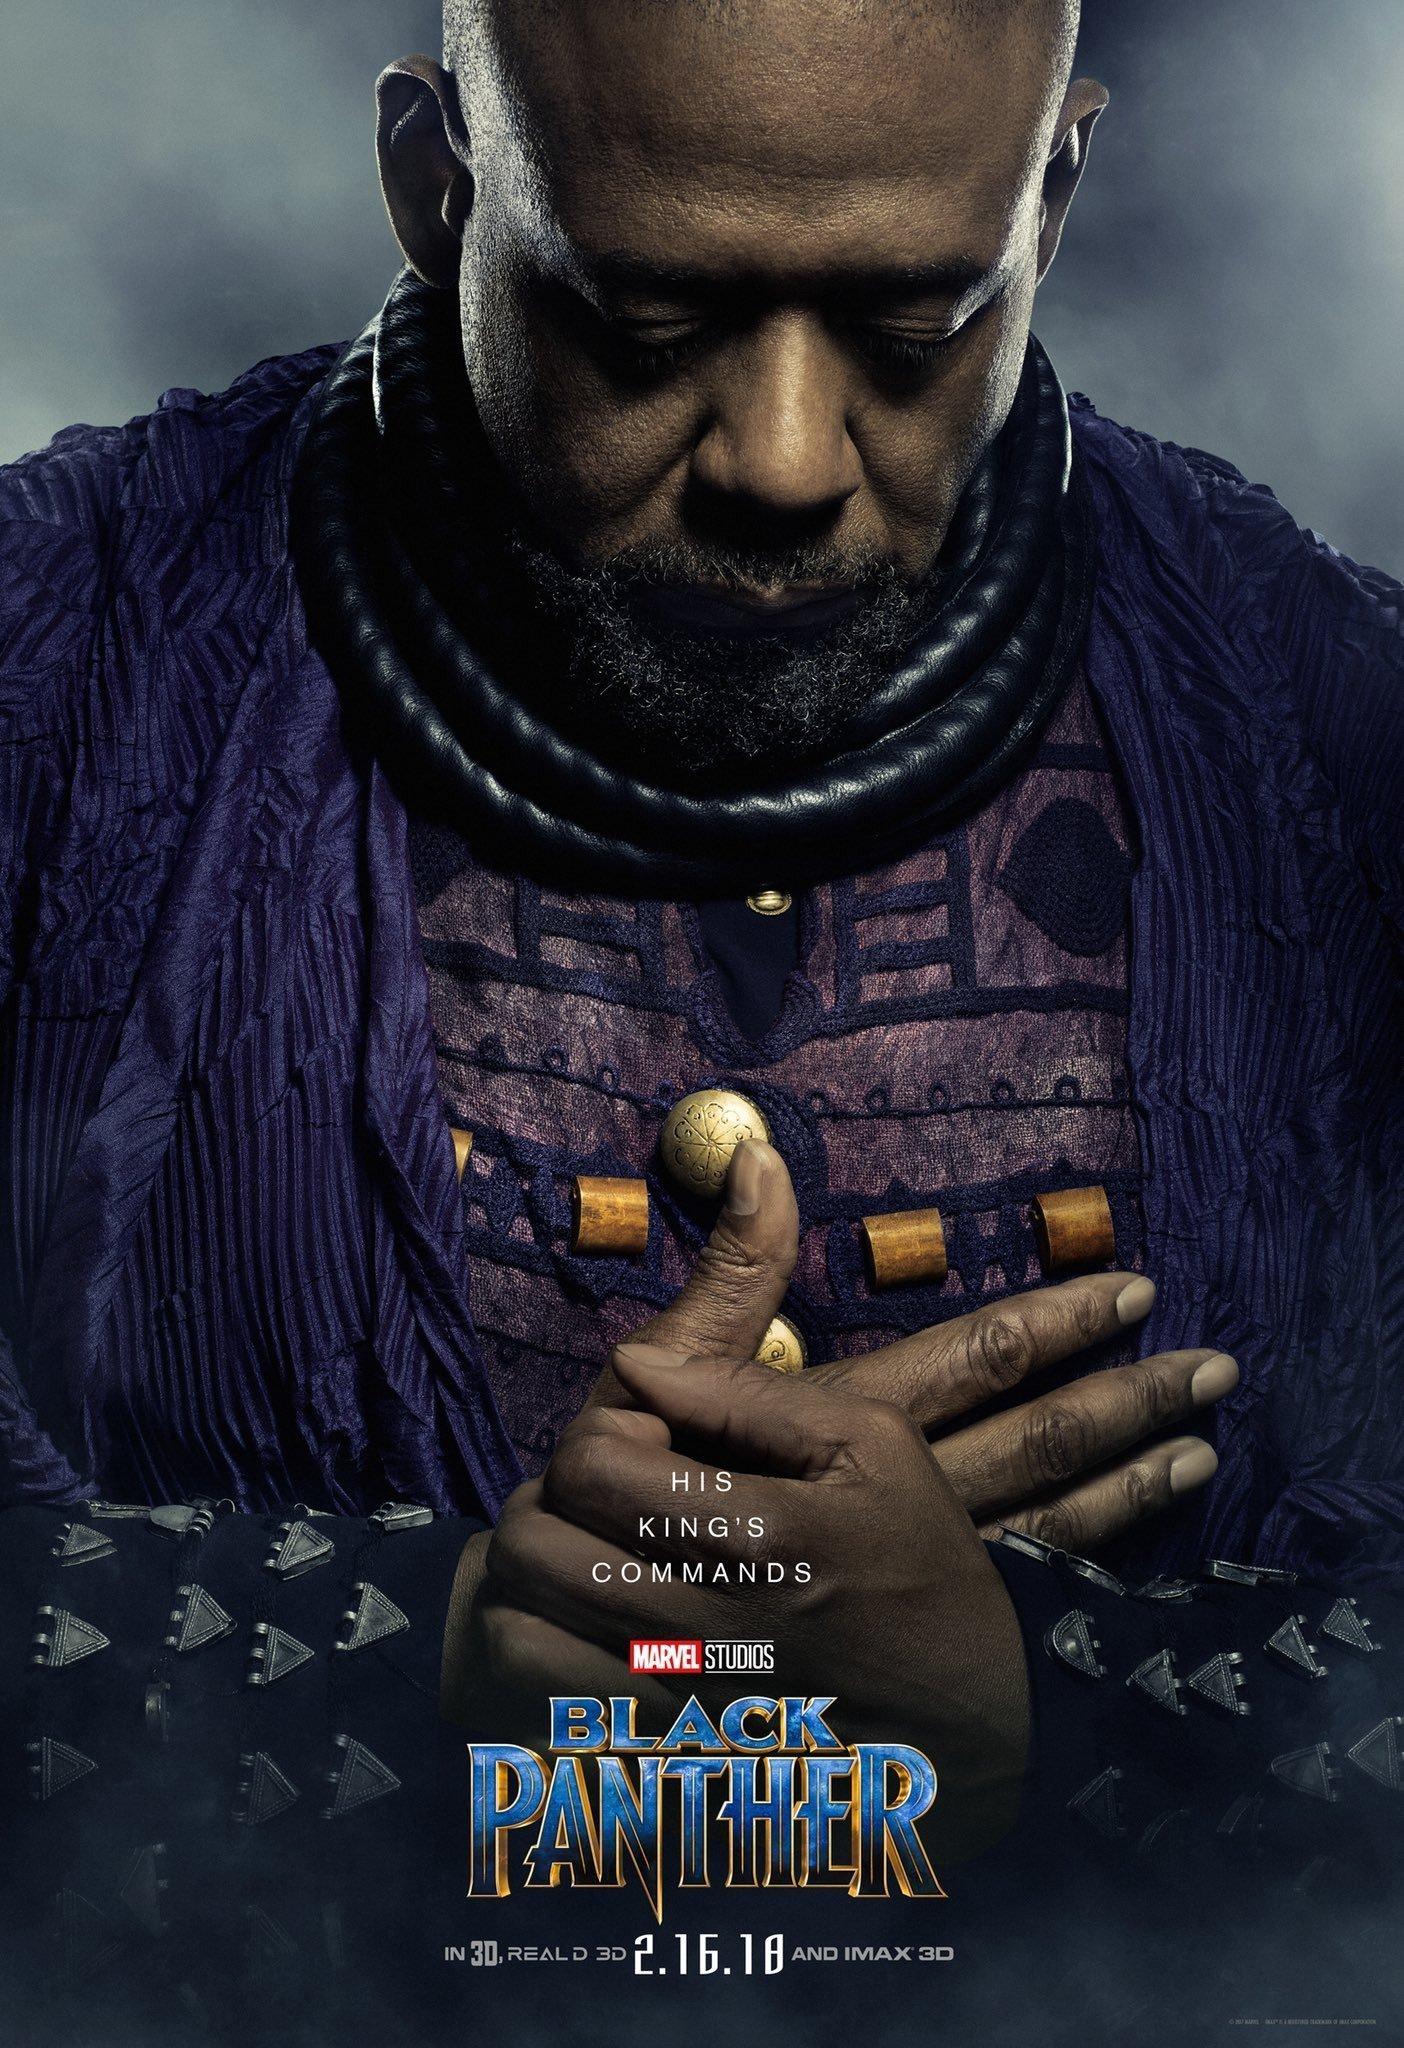 Poster du film Black Panther avec Forest Whitaker (Zuri)